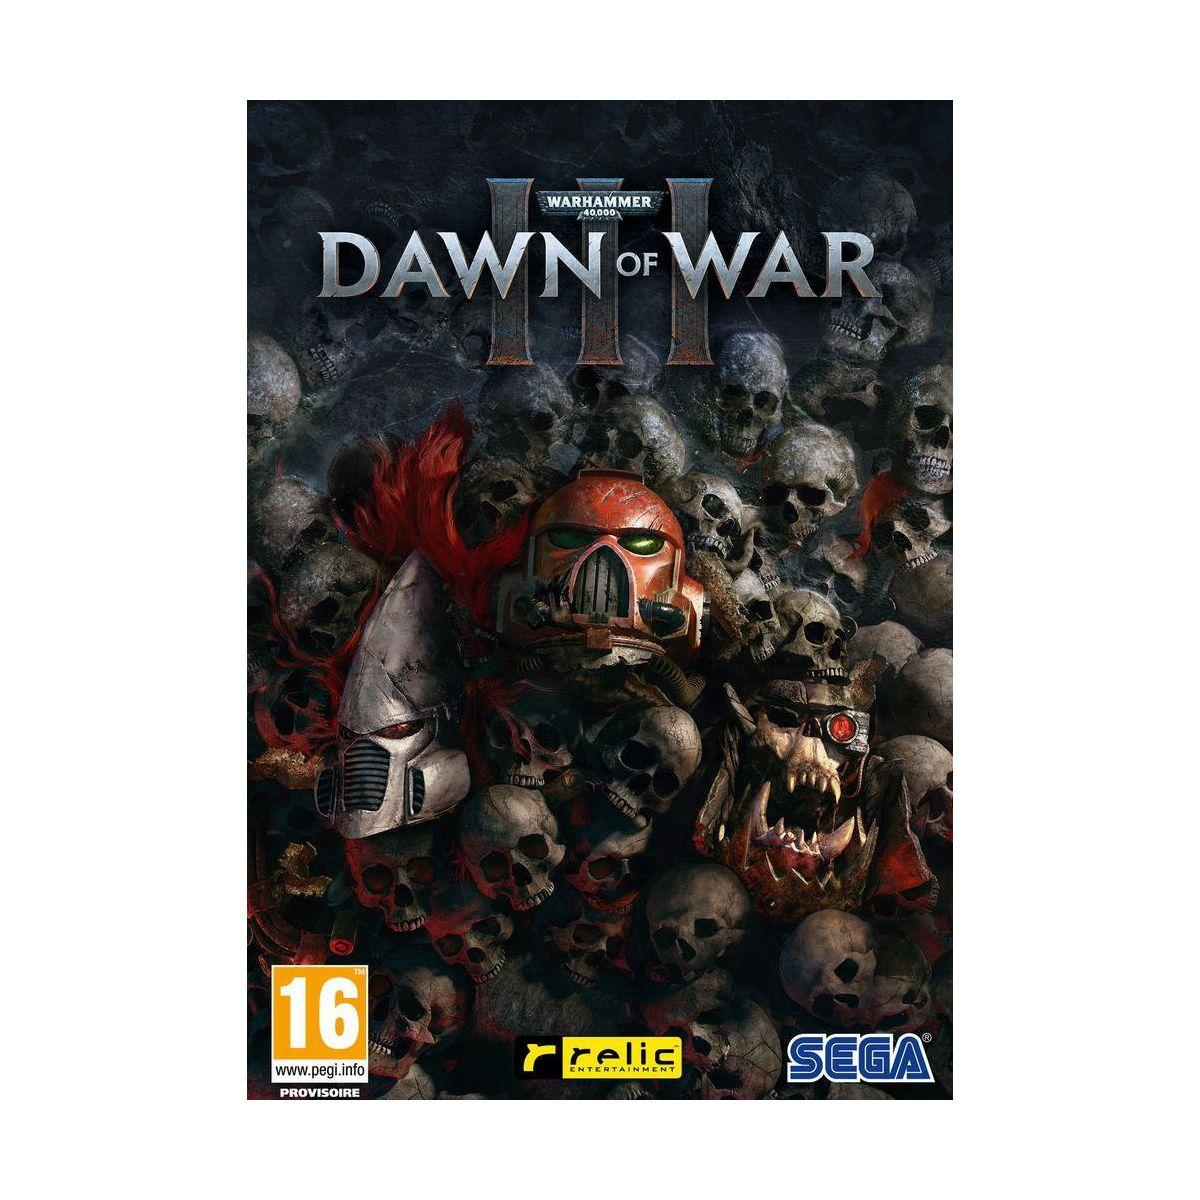 Jeu pc koch media warhammer 40.000 : daw - 3% de remise immédiate avec le code : multi3 (photo)